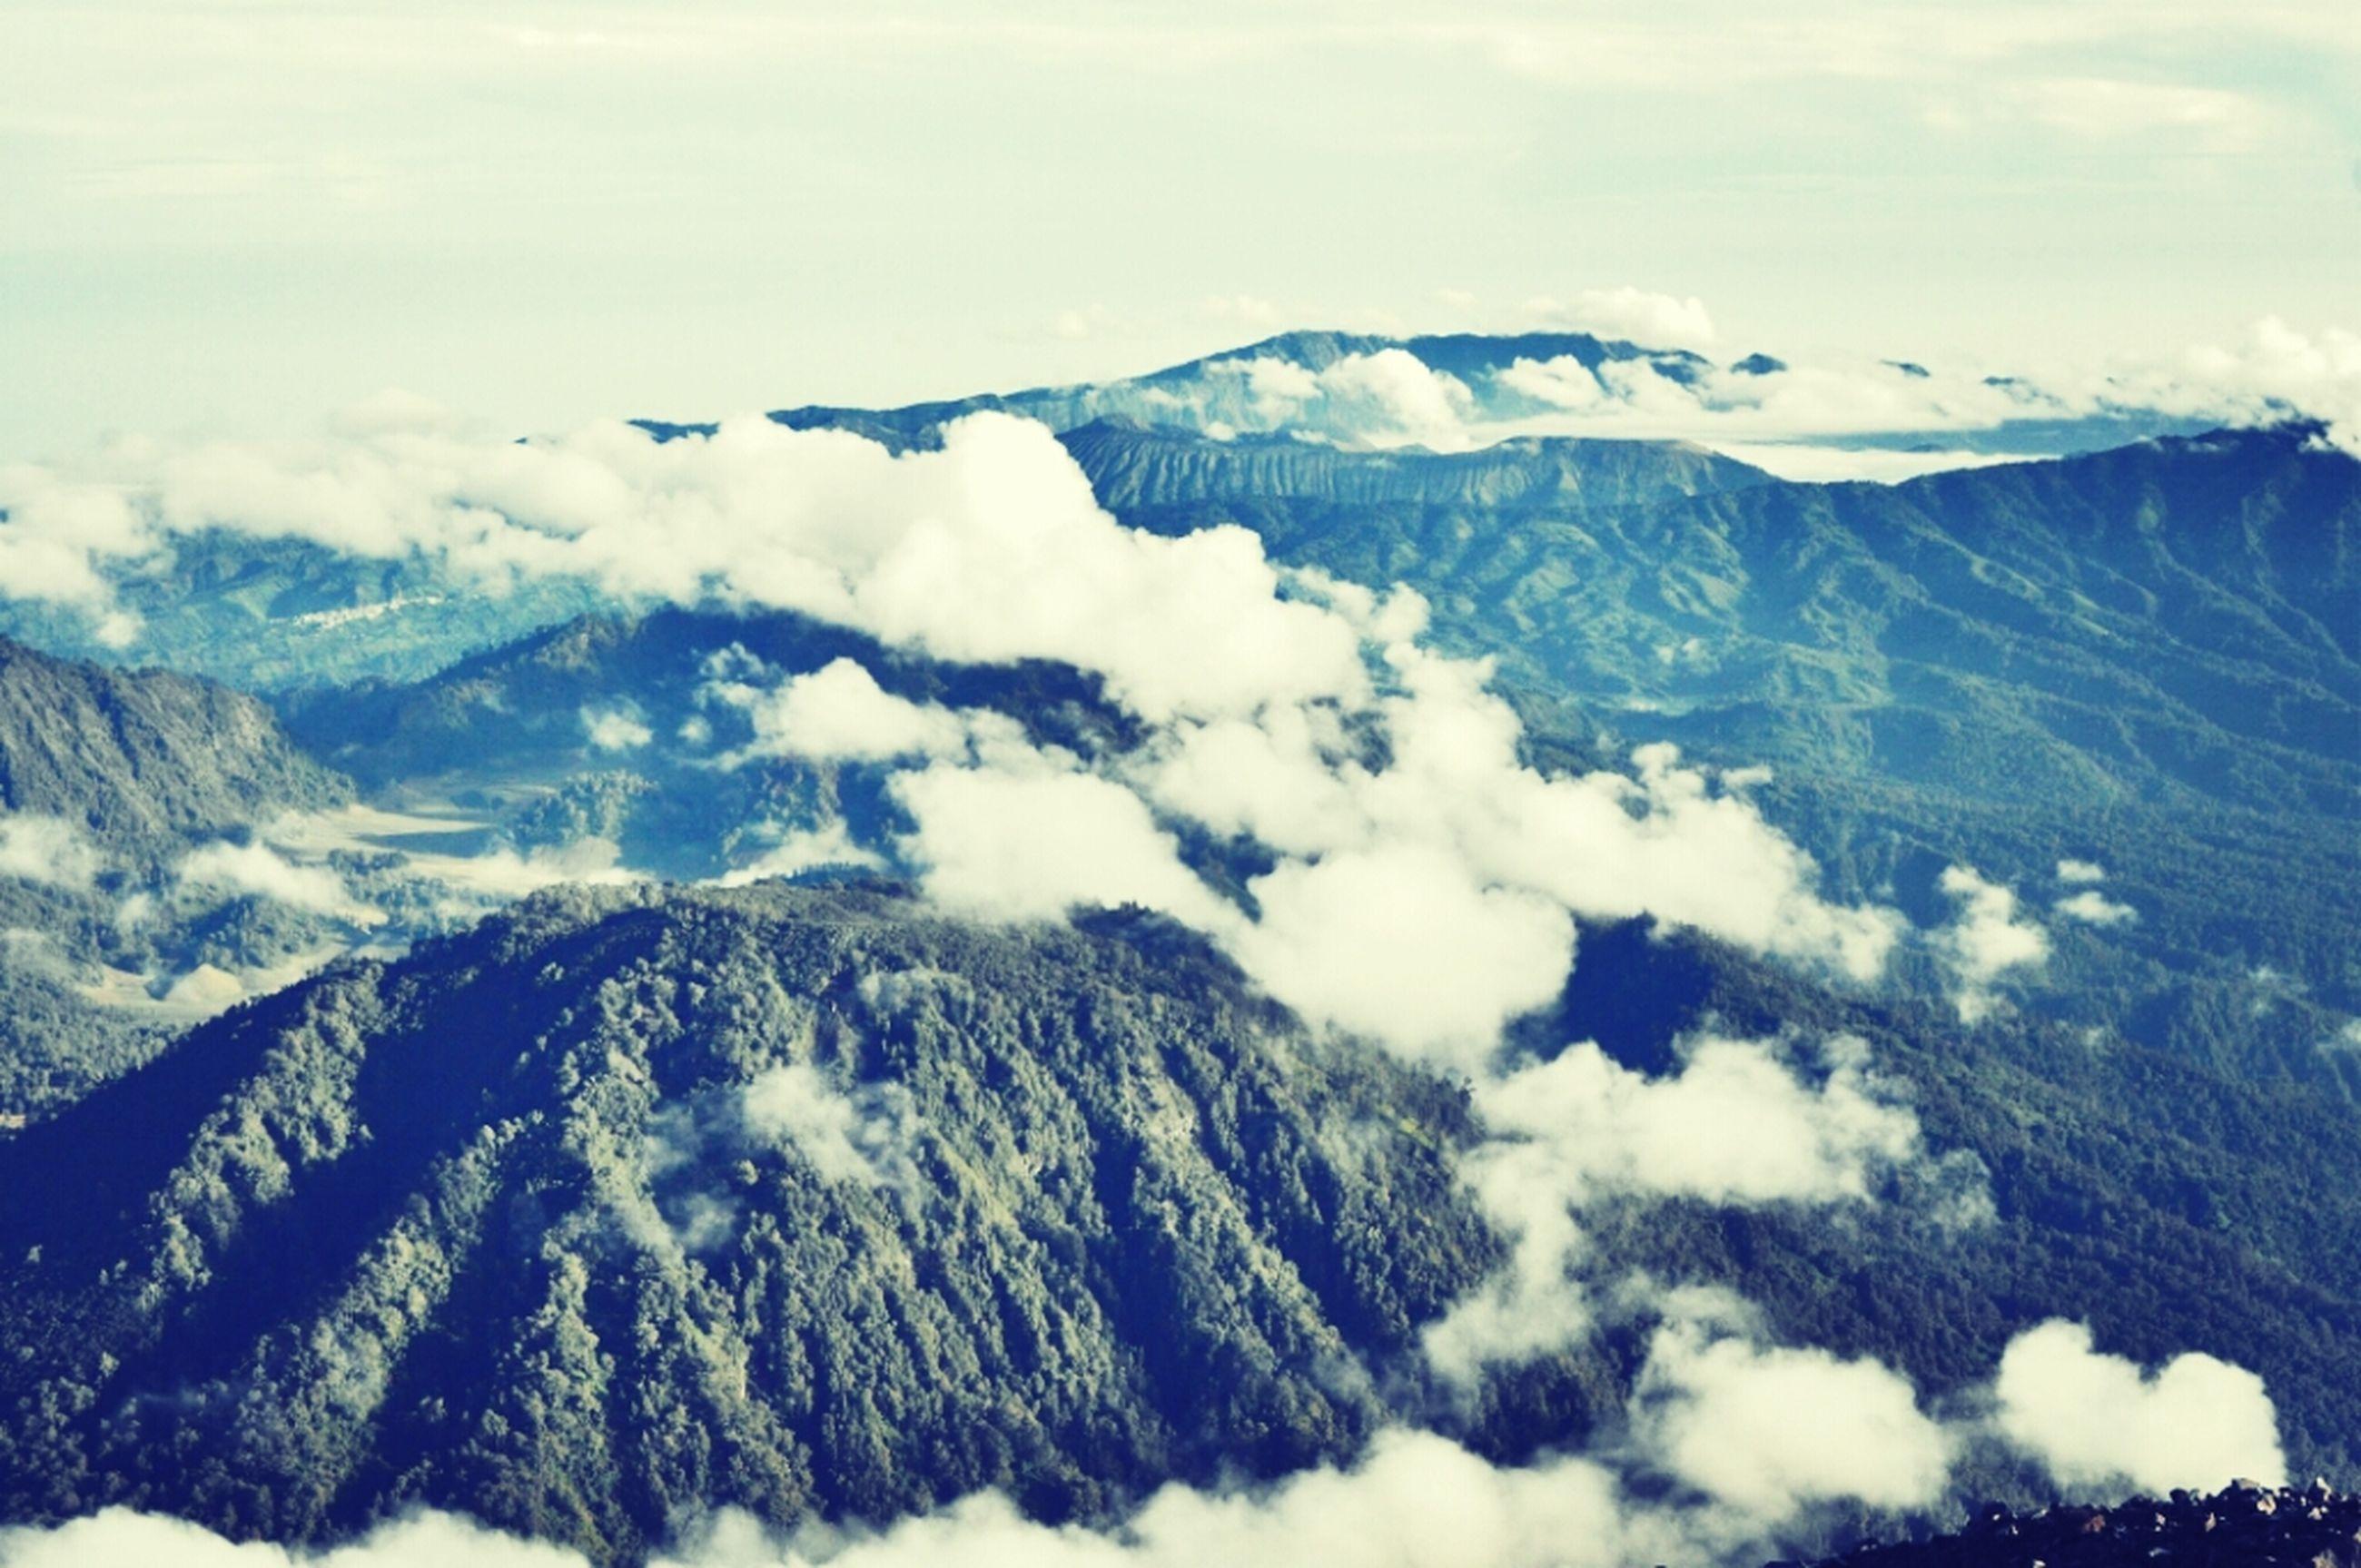 mountain, mountain range, scenics, tranquil scene, tranquility, beauty in nature, snow, landscape, sky, snowcapped mountain, winter, cold temperature, nature, cloud - sky, non-urban scene, majestic, idyllic, cloud, mountain peak, weather